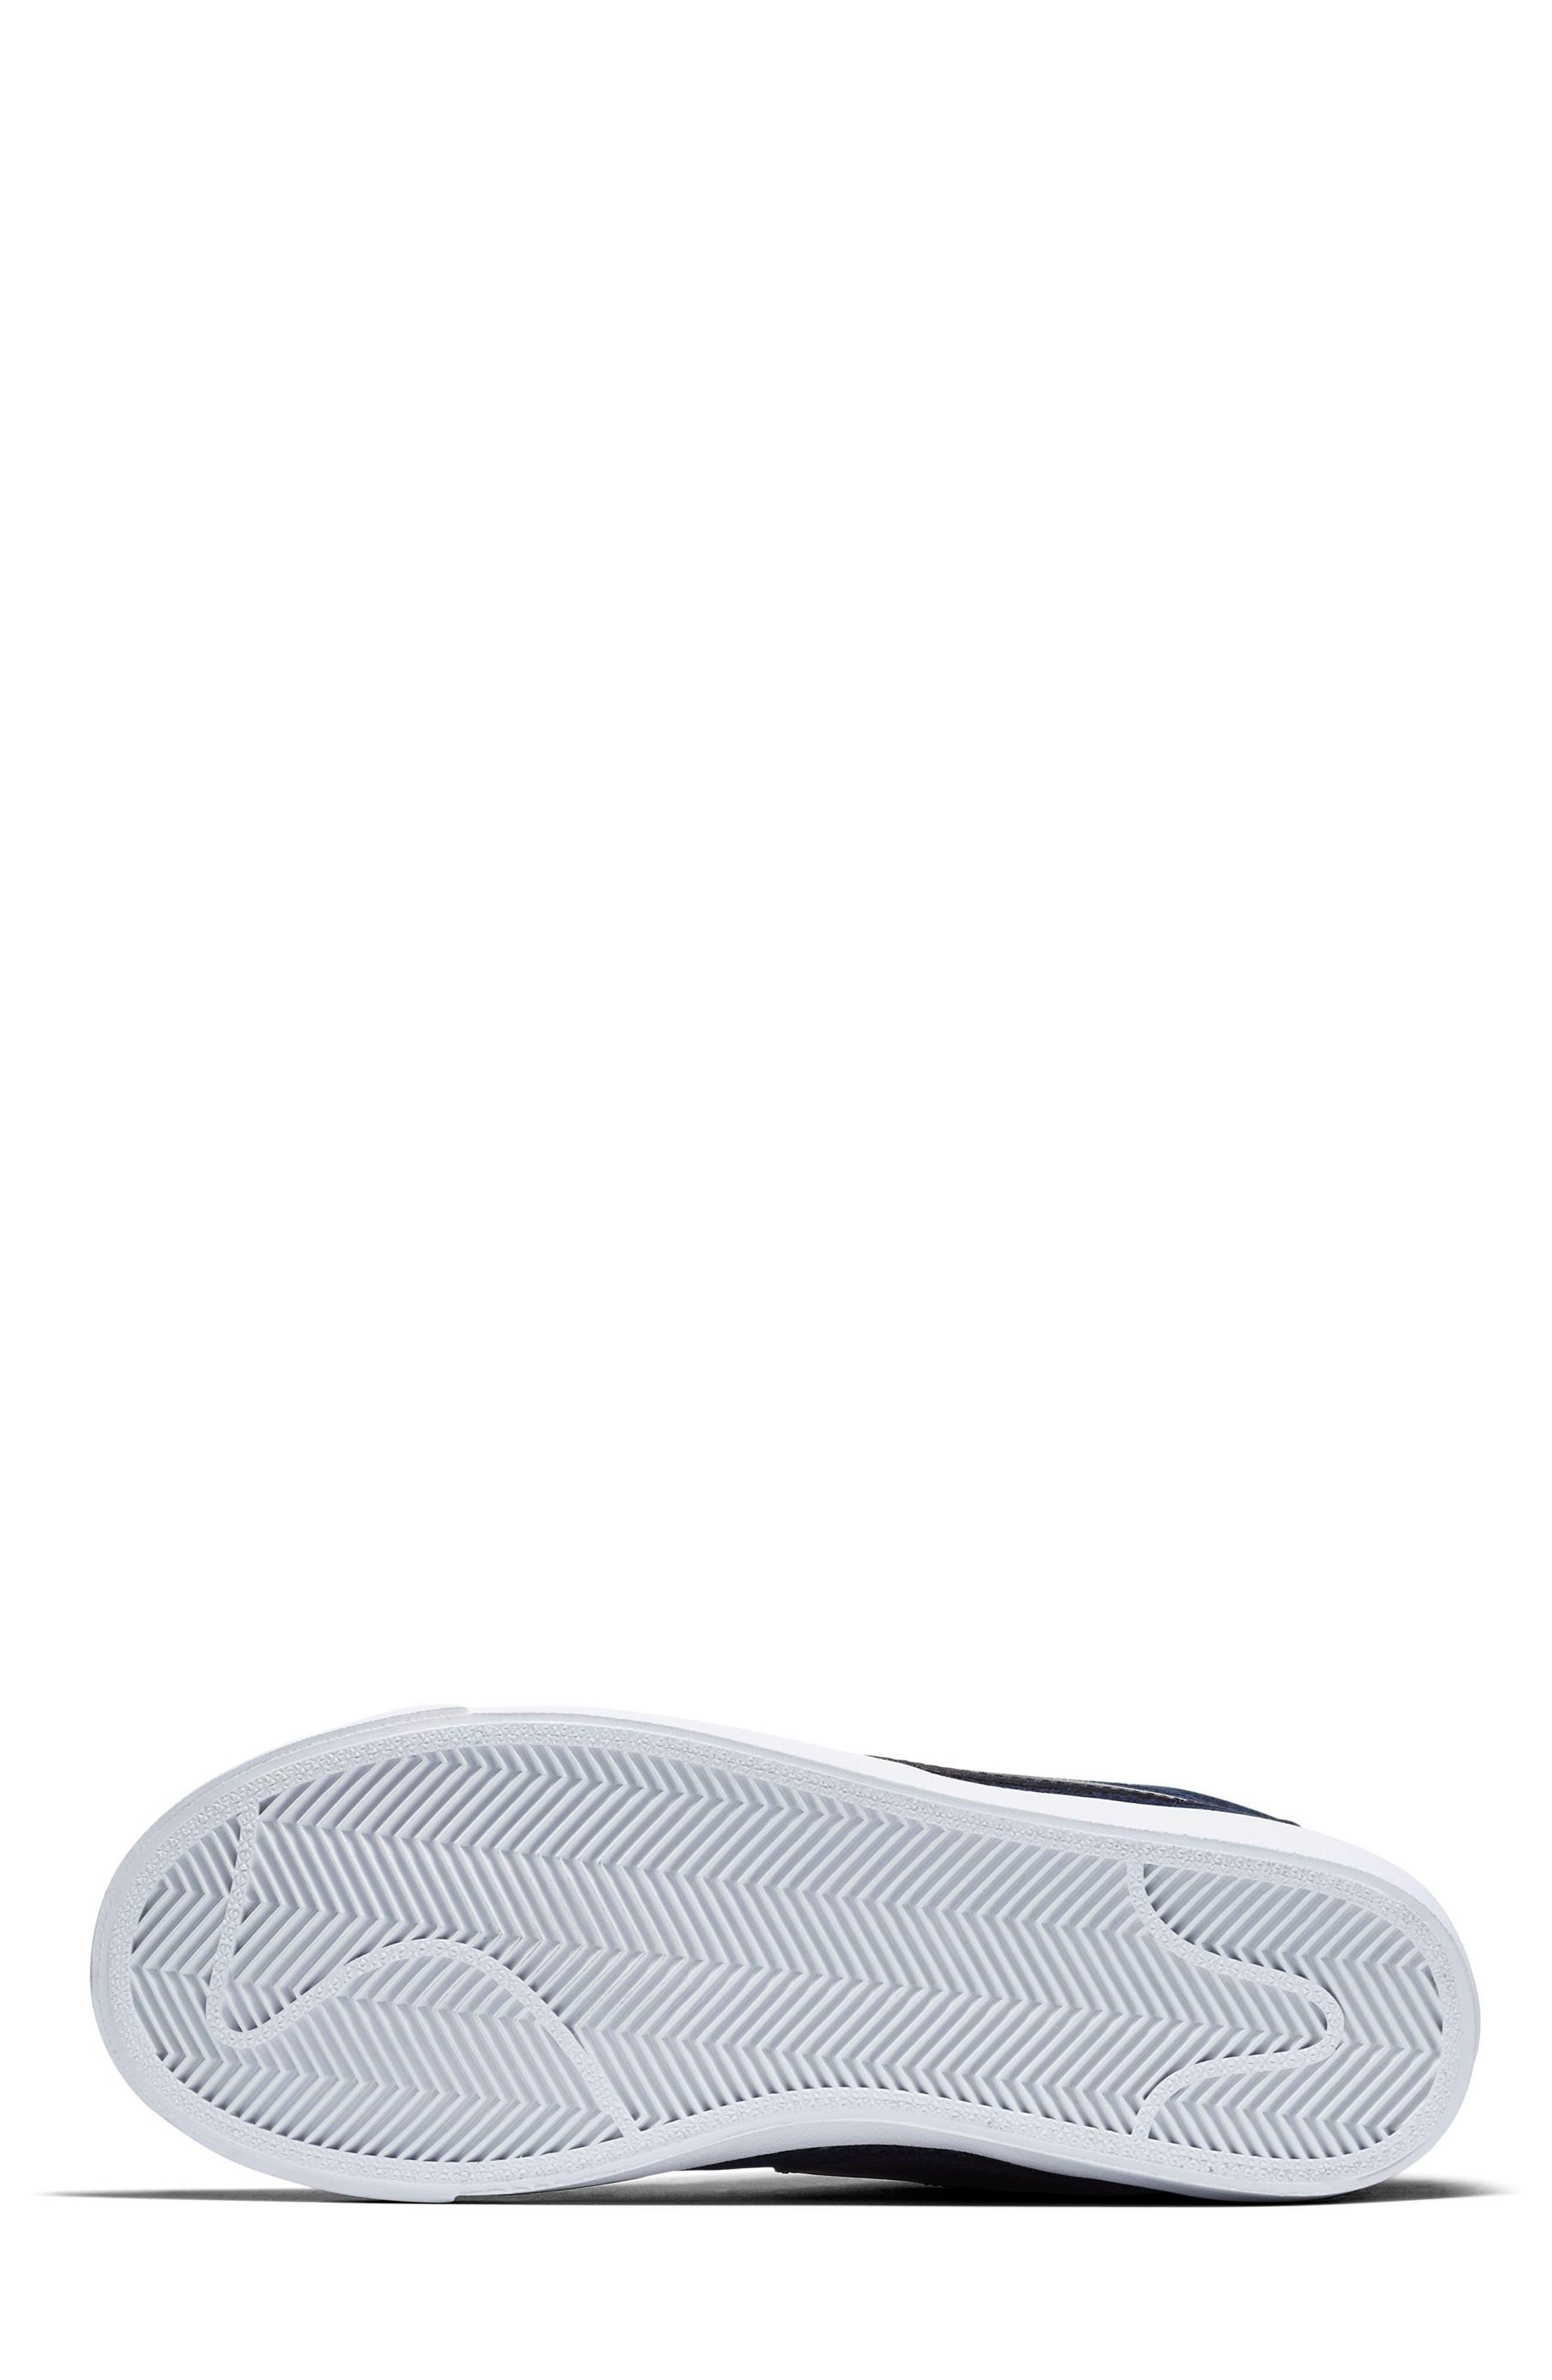 Blazer Mid Premium LX Sneaker,                             Alternate thumbnail 5, color,                             400